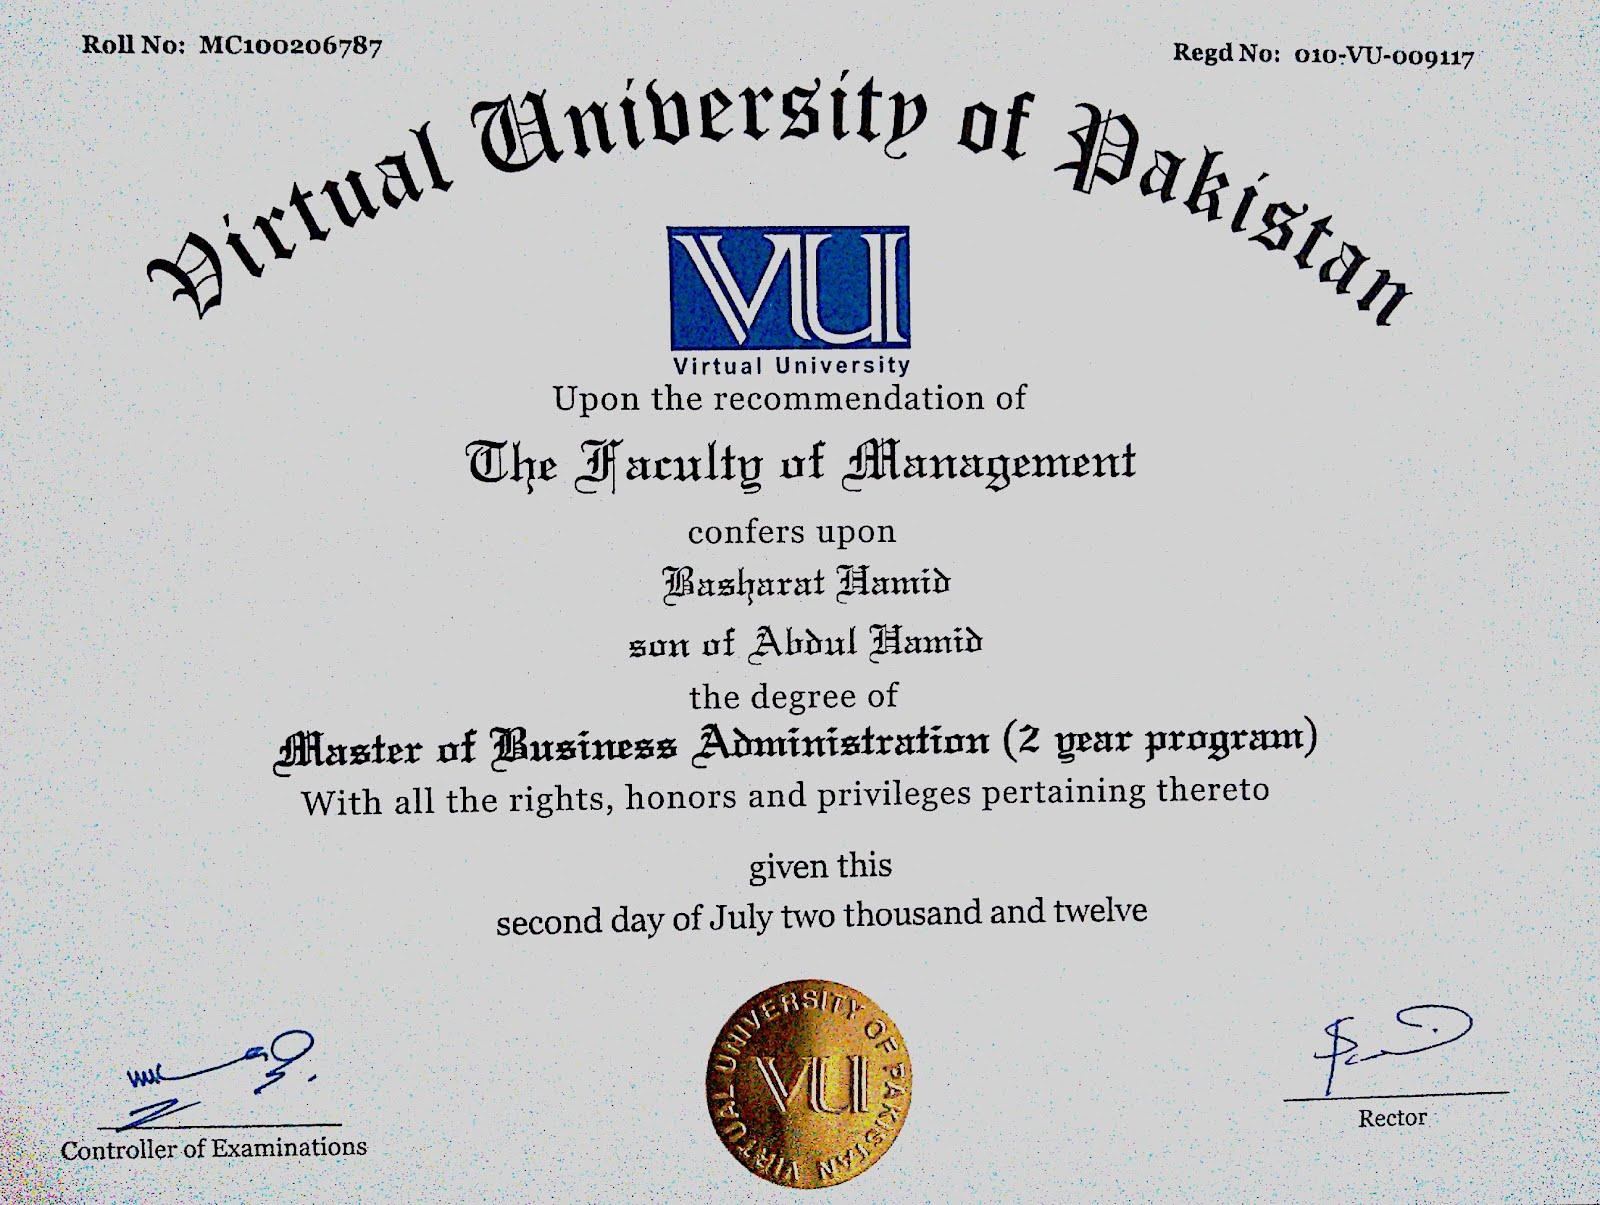 Virtual University of Pakistan - Master of Businbess Administration